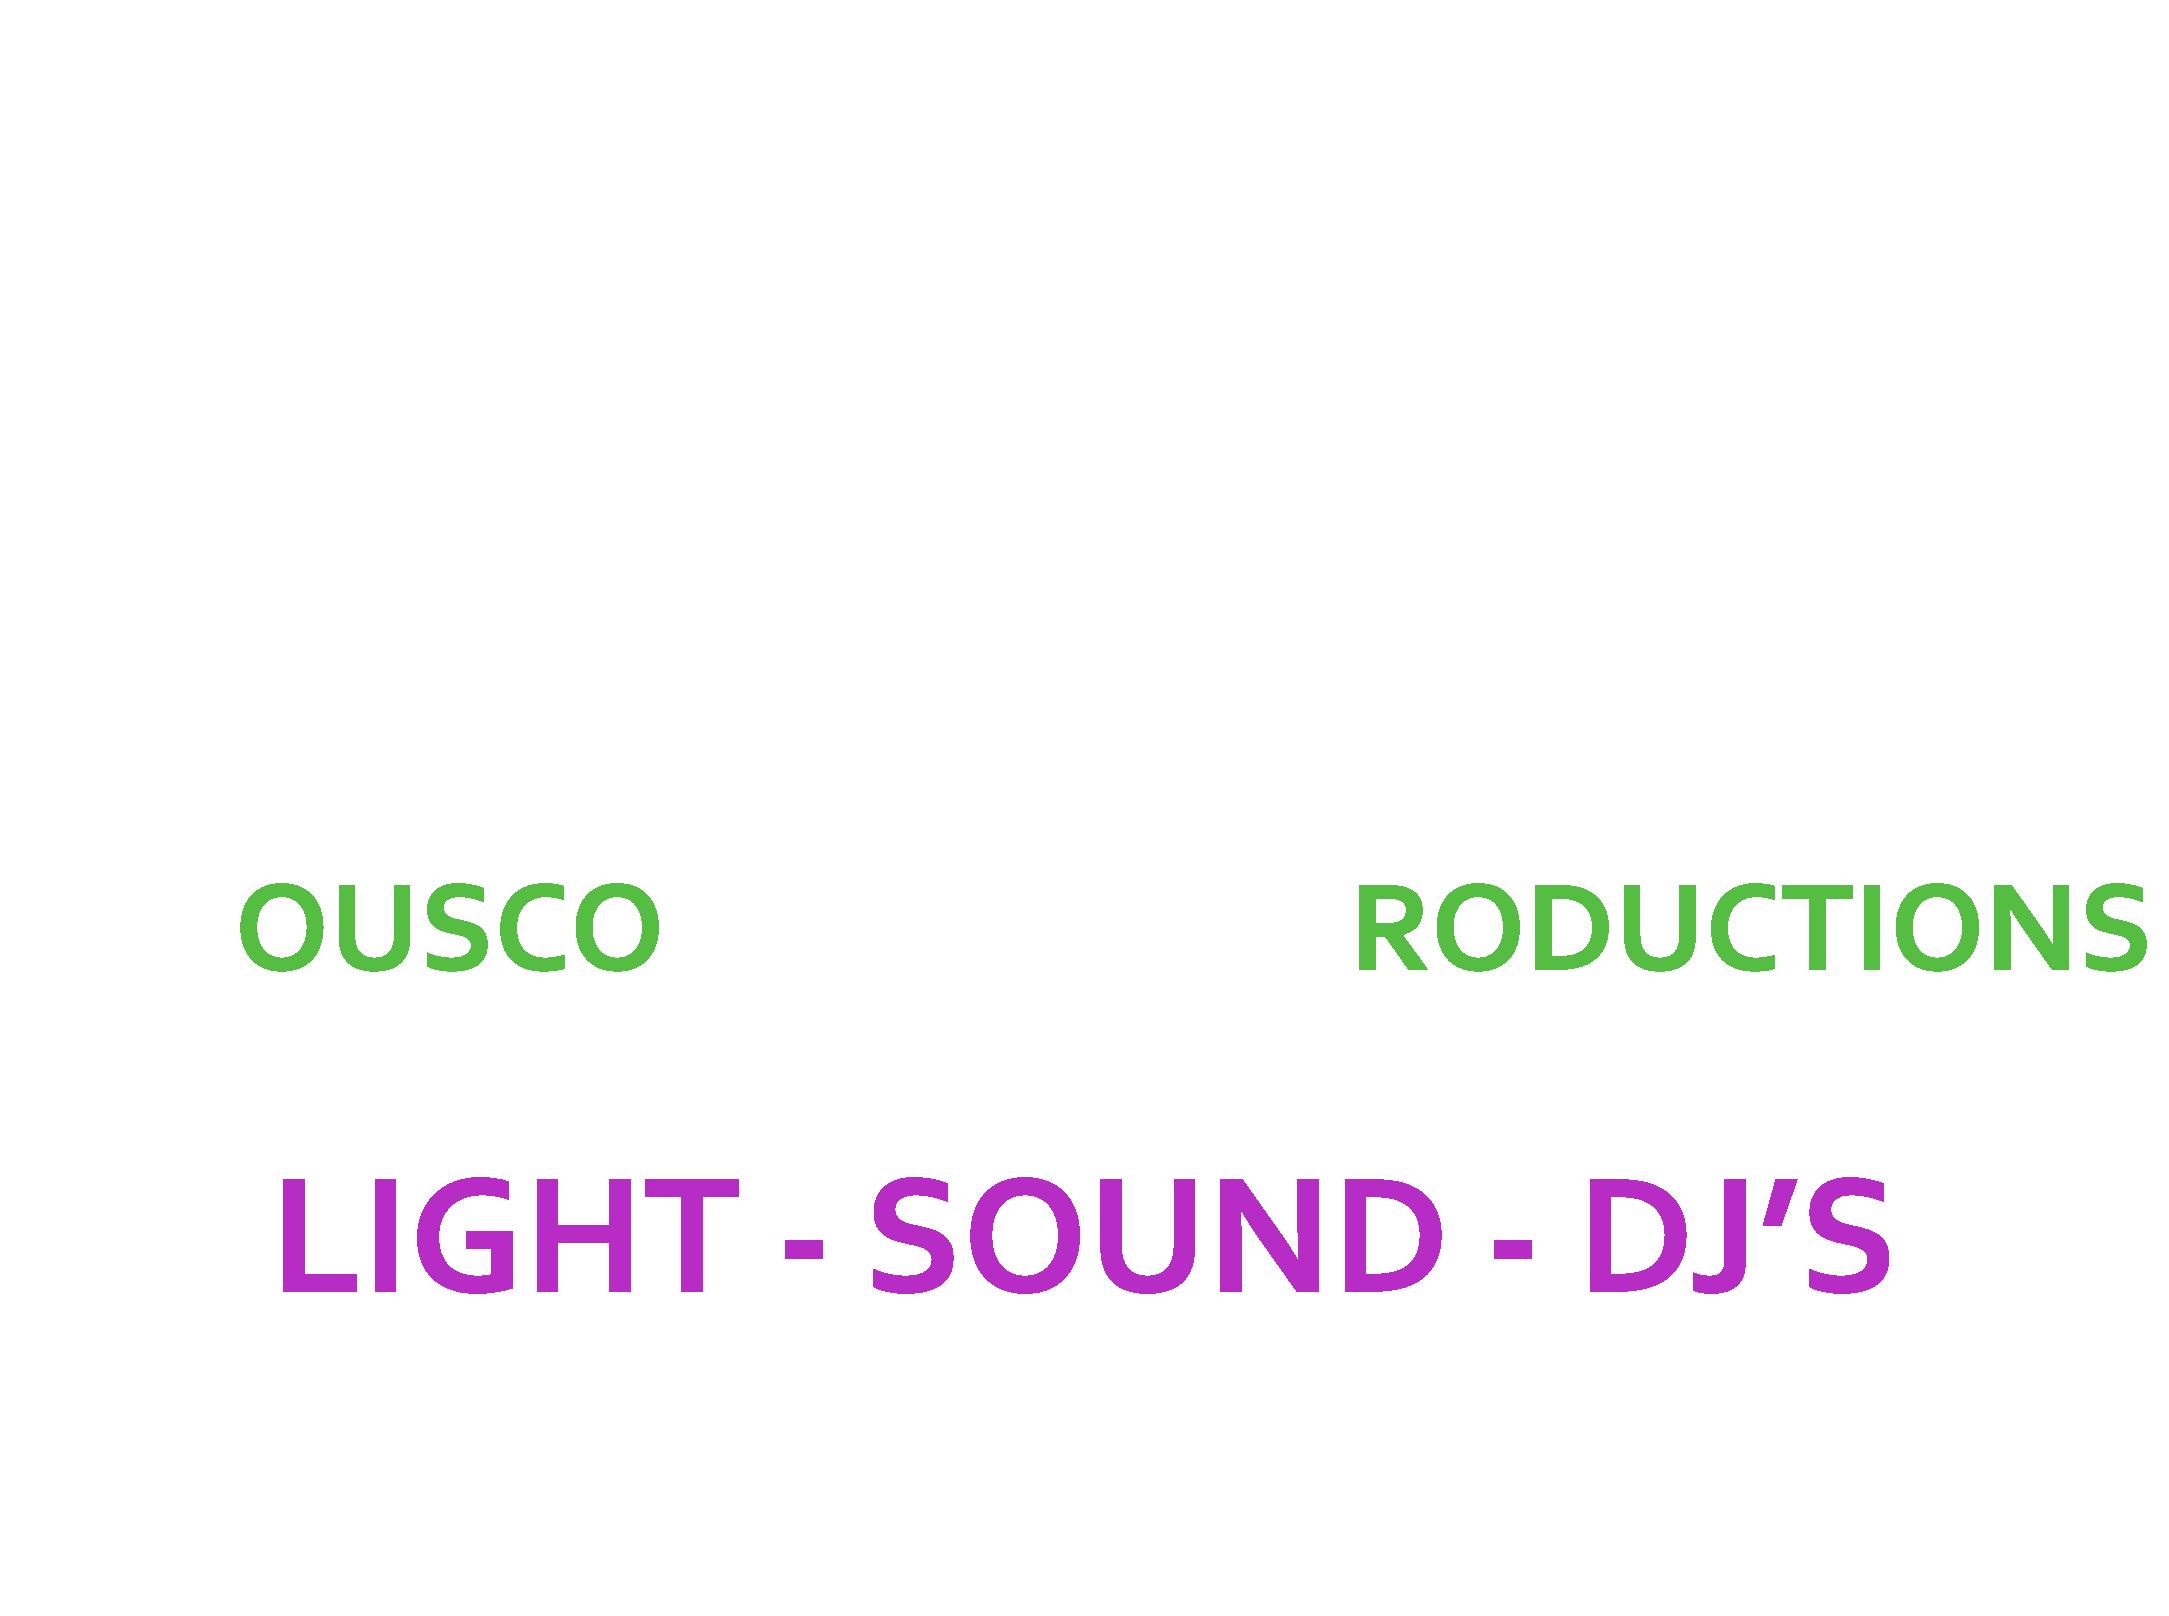 Rousco Productions